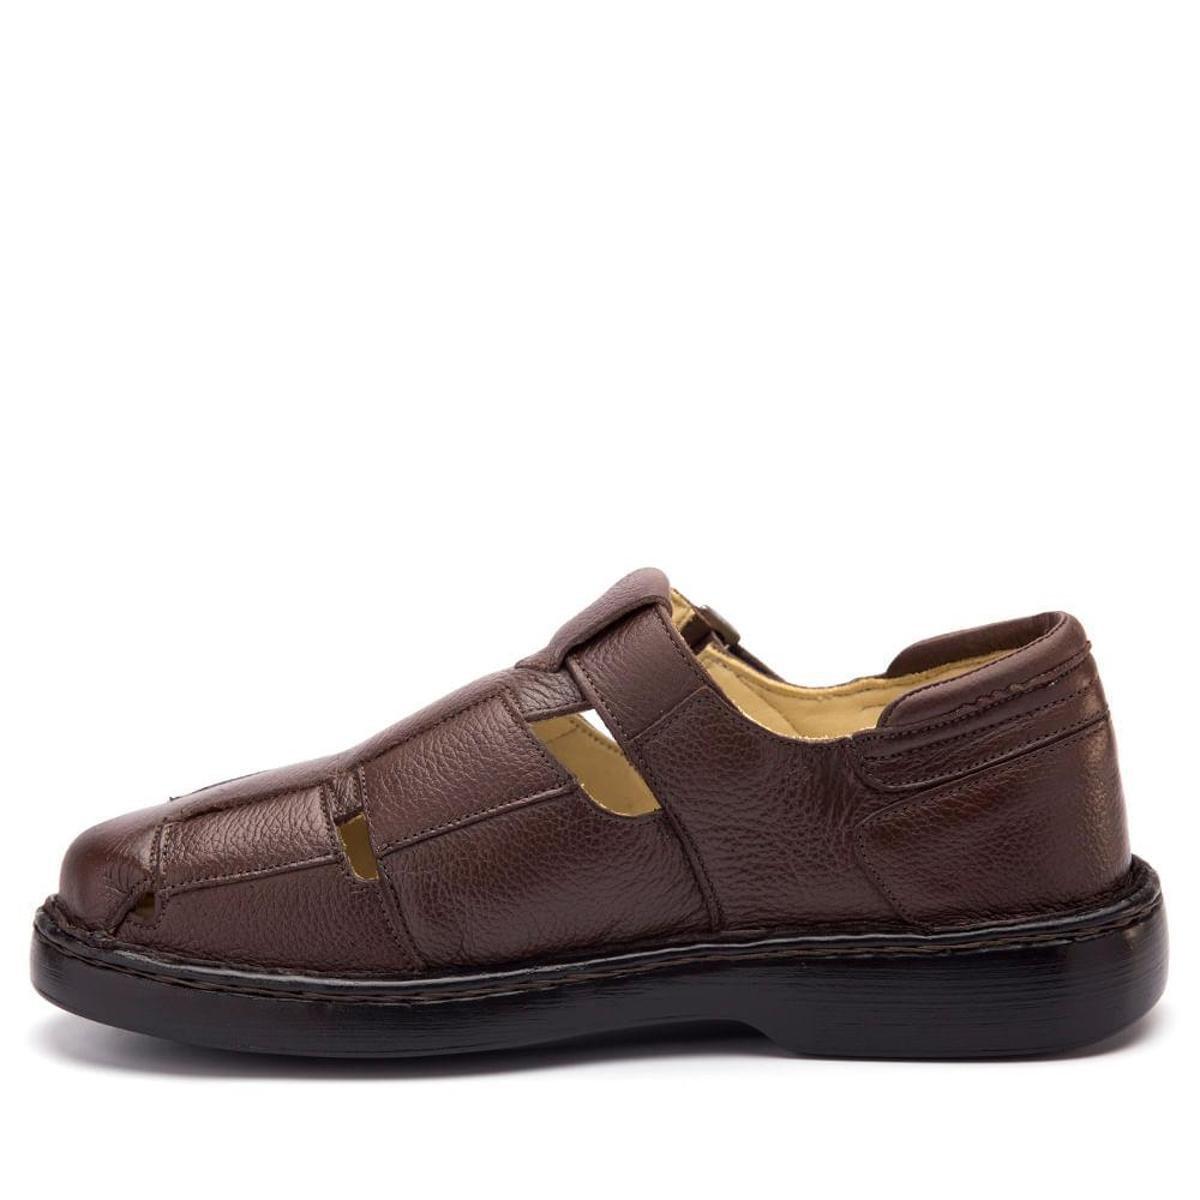 Floater Couro em Couro Sandália Doctor Doctor 306 Sandália Masculina Masculina Café Café Floater Shoes Shoes em 306 wxXOgn007A